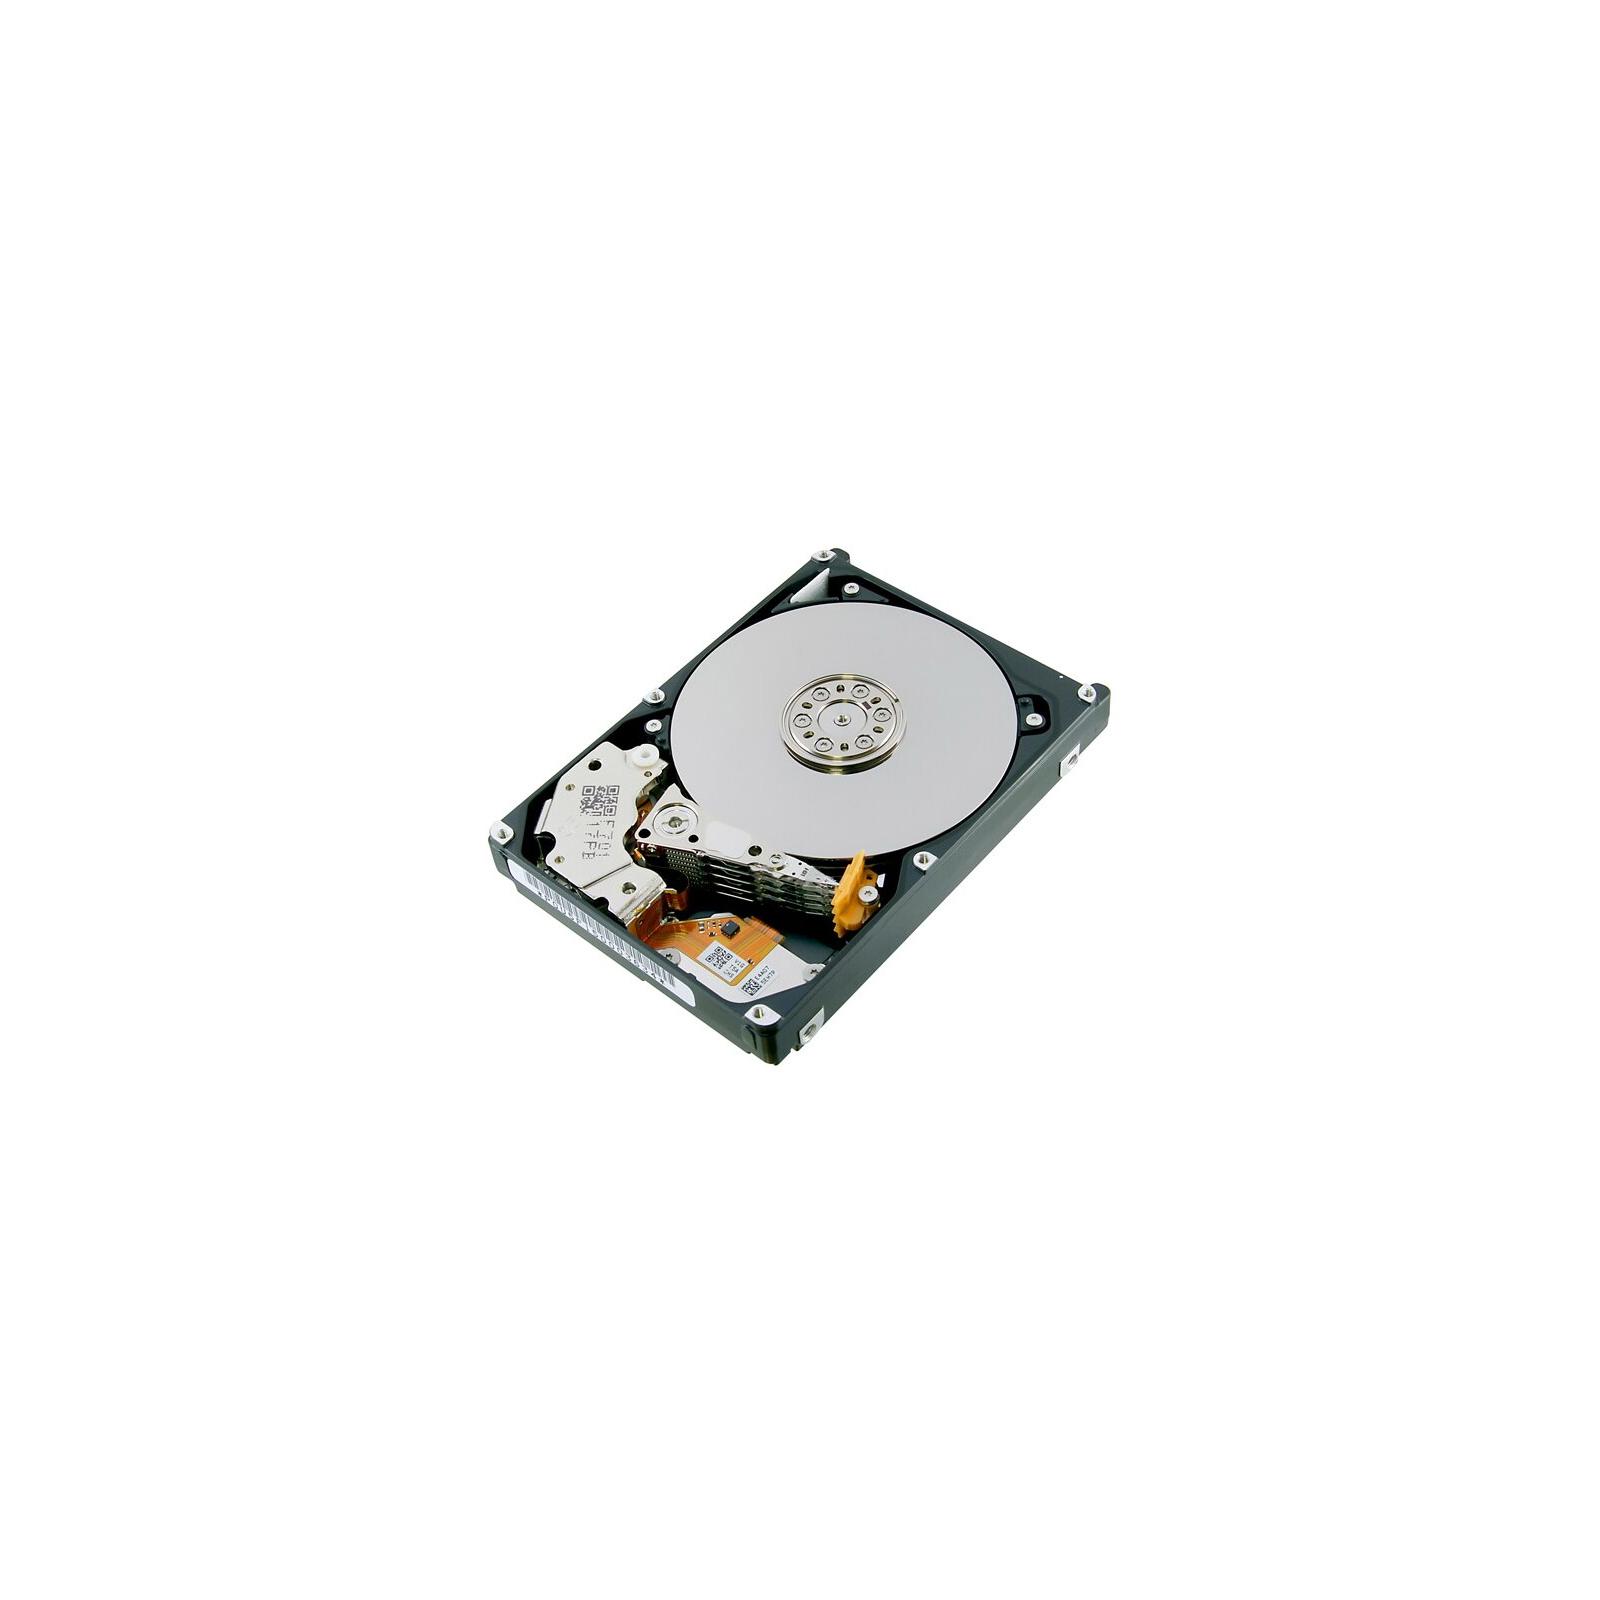 "Жесткий диск для сервера 2.5"" 900GB SAS 128MB 10500rpm Toshiba (AL15SEB090N) изображение 2"